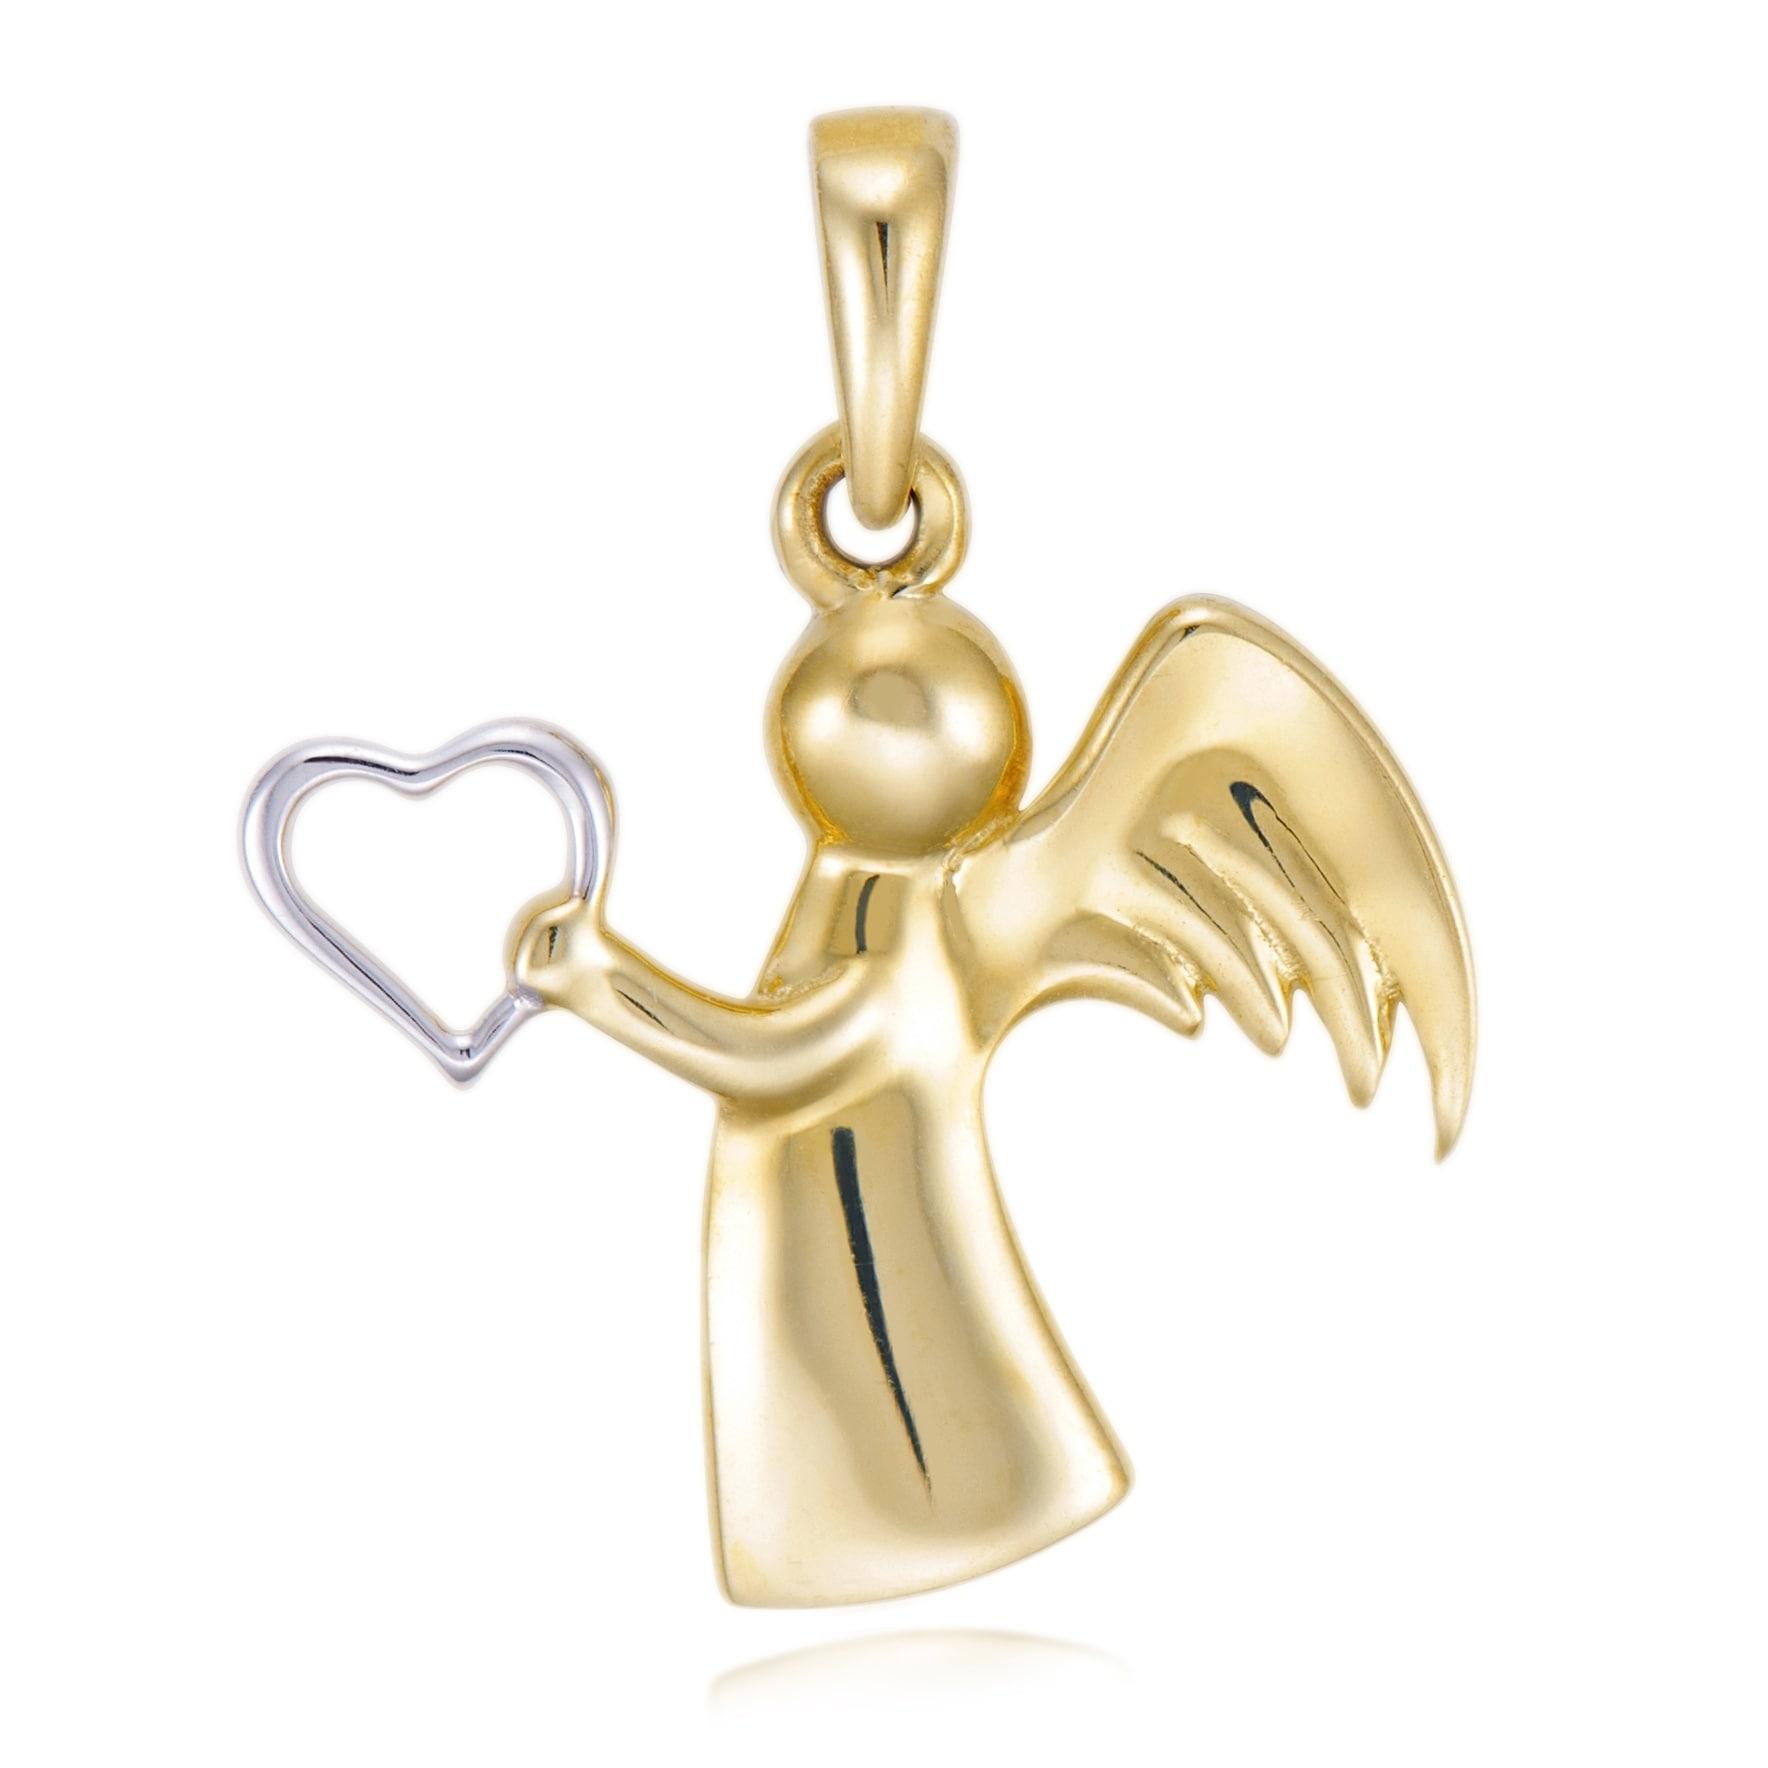 DiamondJewelryNY Sterling Silver Papal Crucifix Pendant